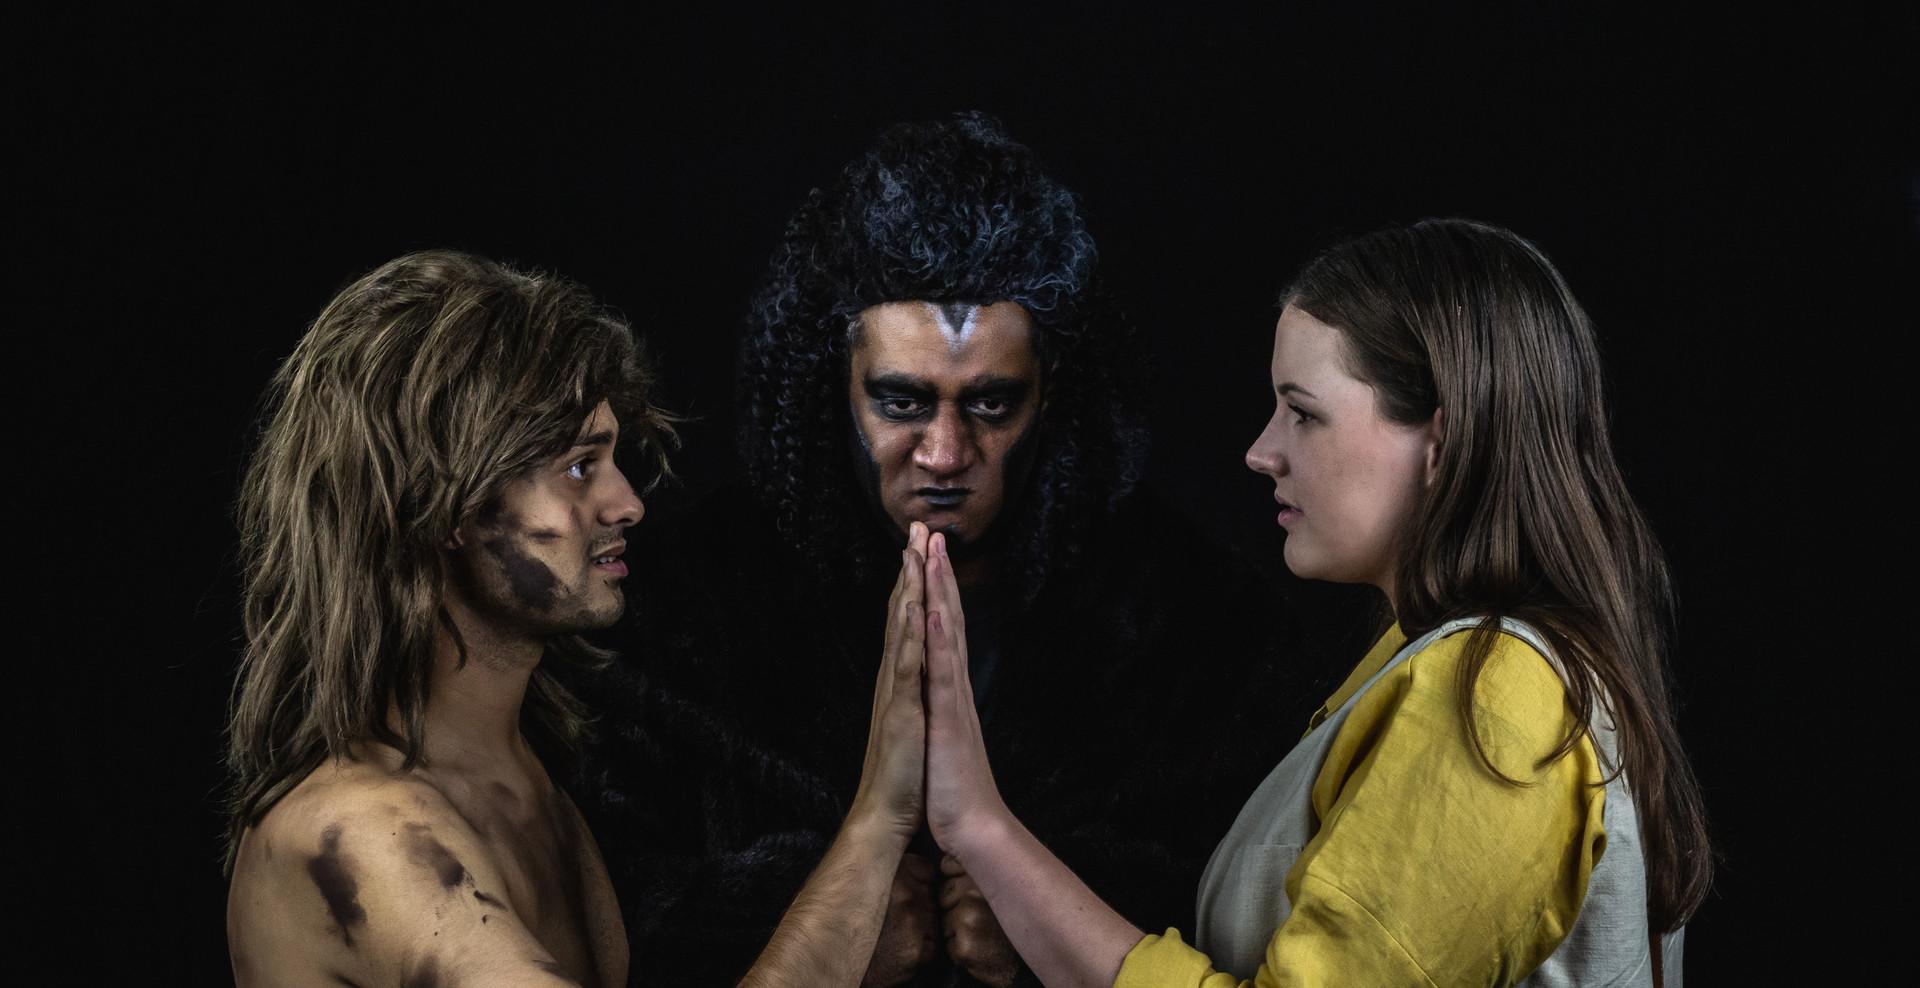 Tarzan, Kerchak and Jane